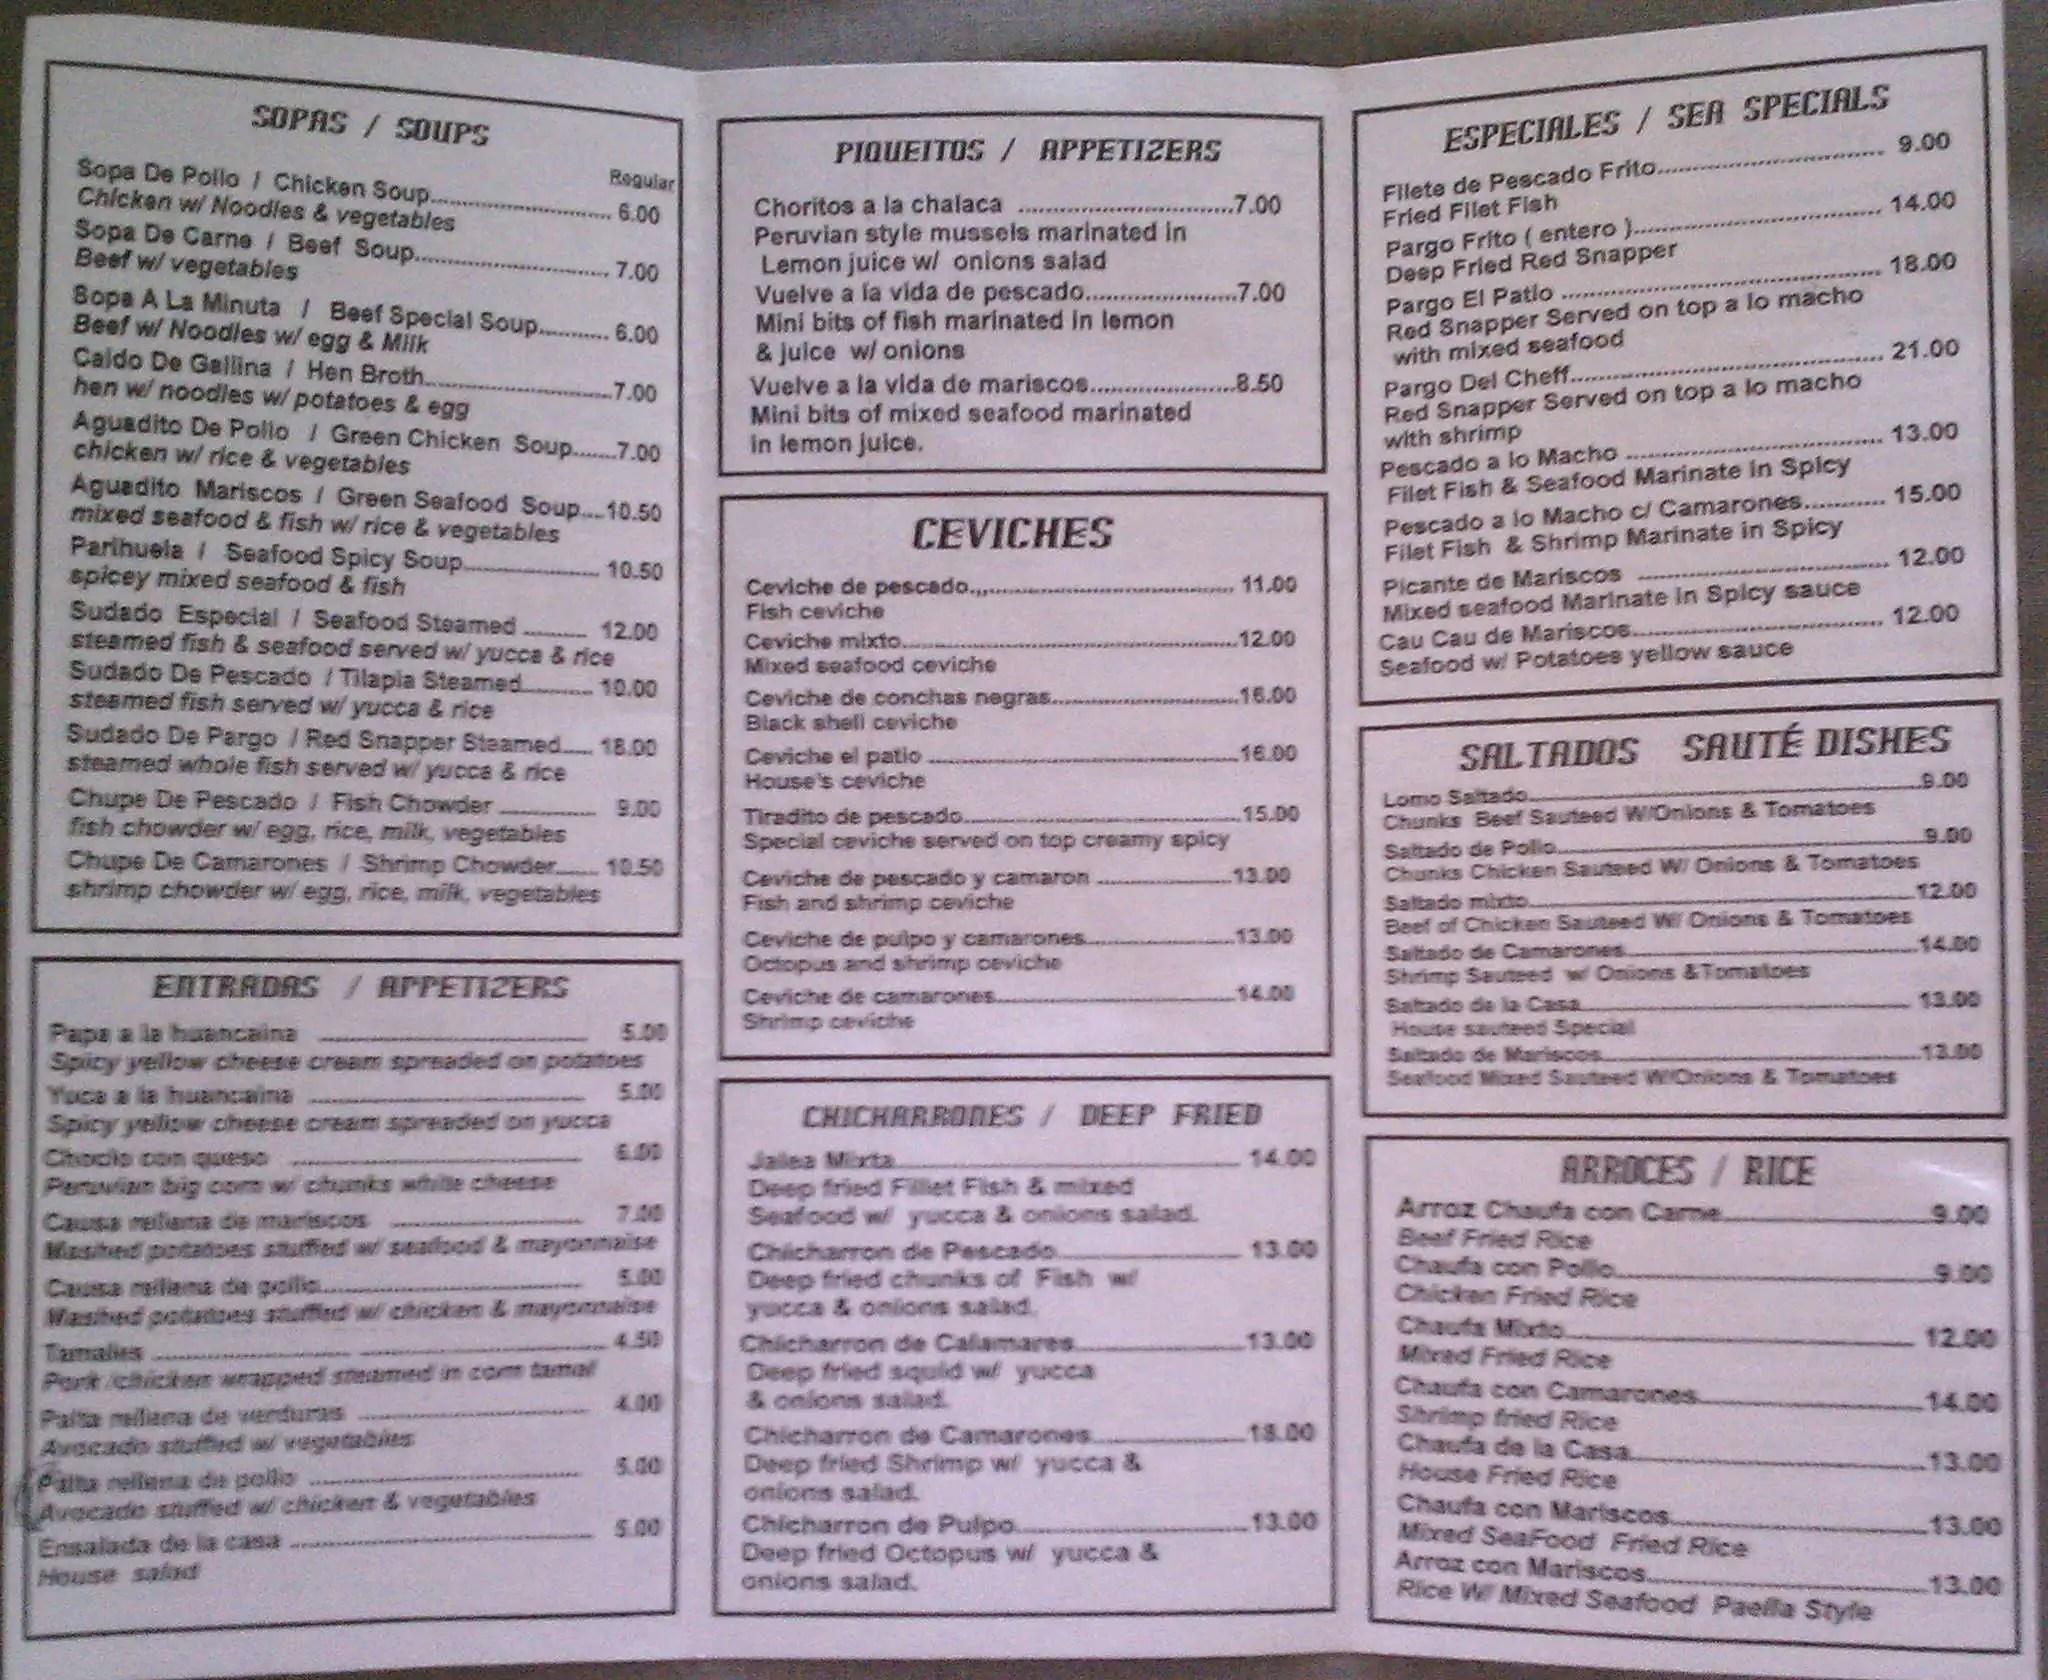 el patio restaurant menu menu for el